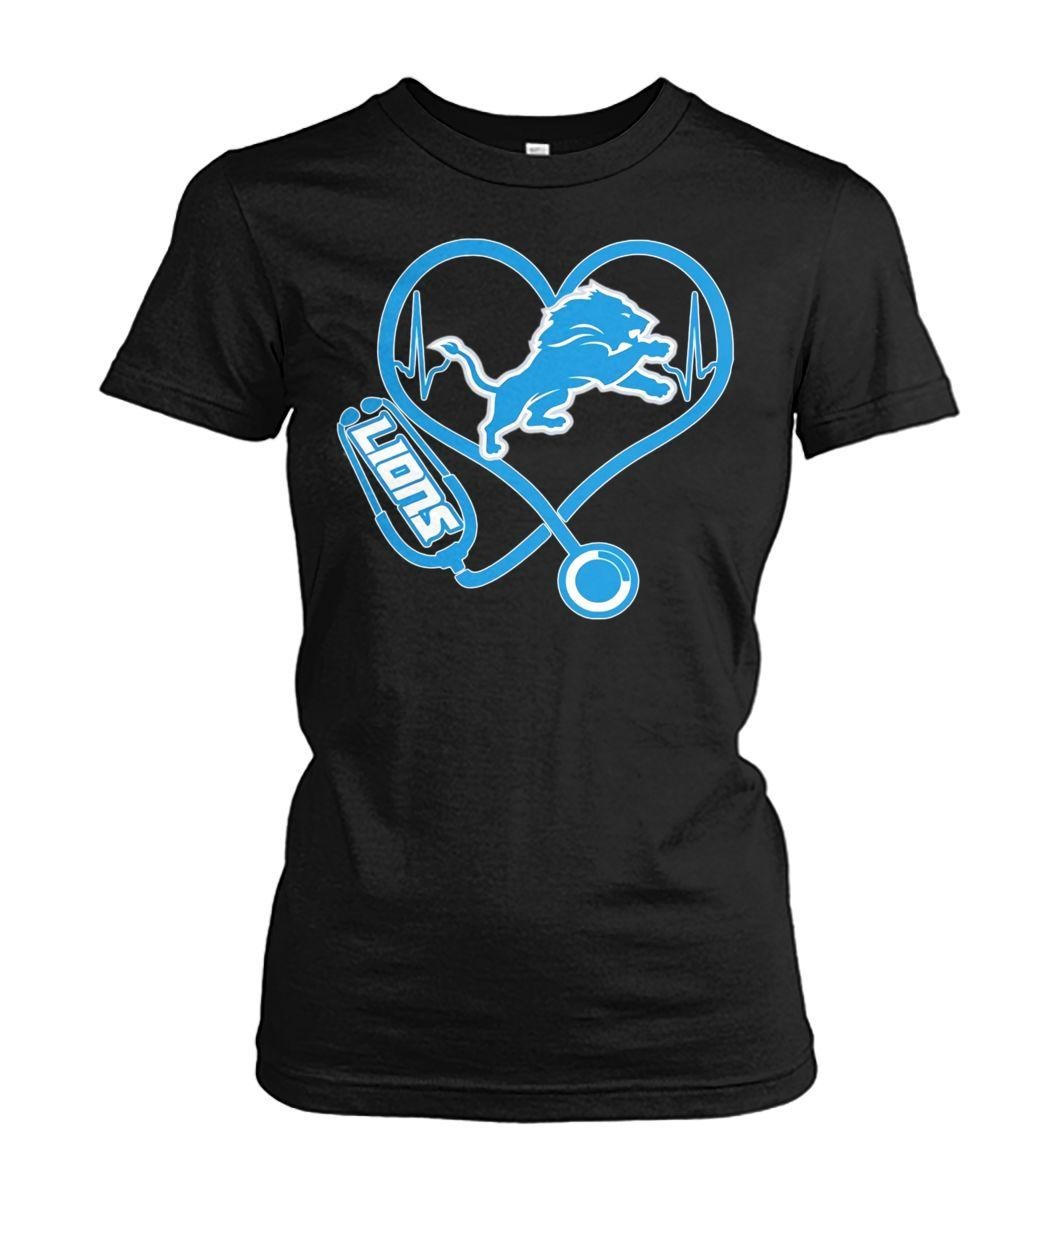 Nurse heartbeat Detroit Lions Ladies Tee